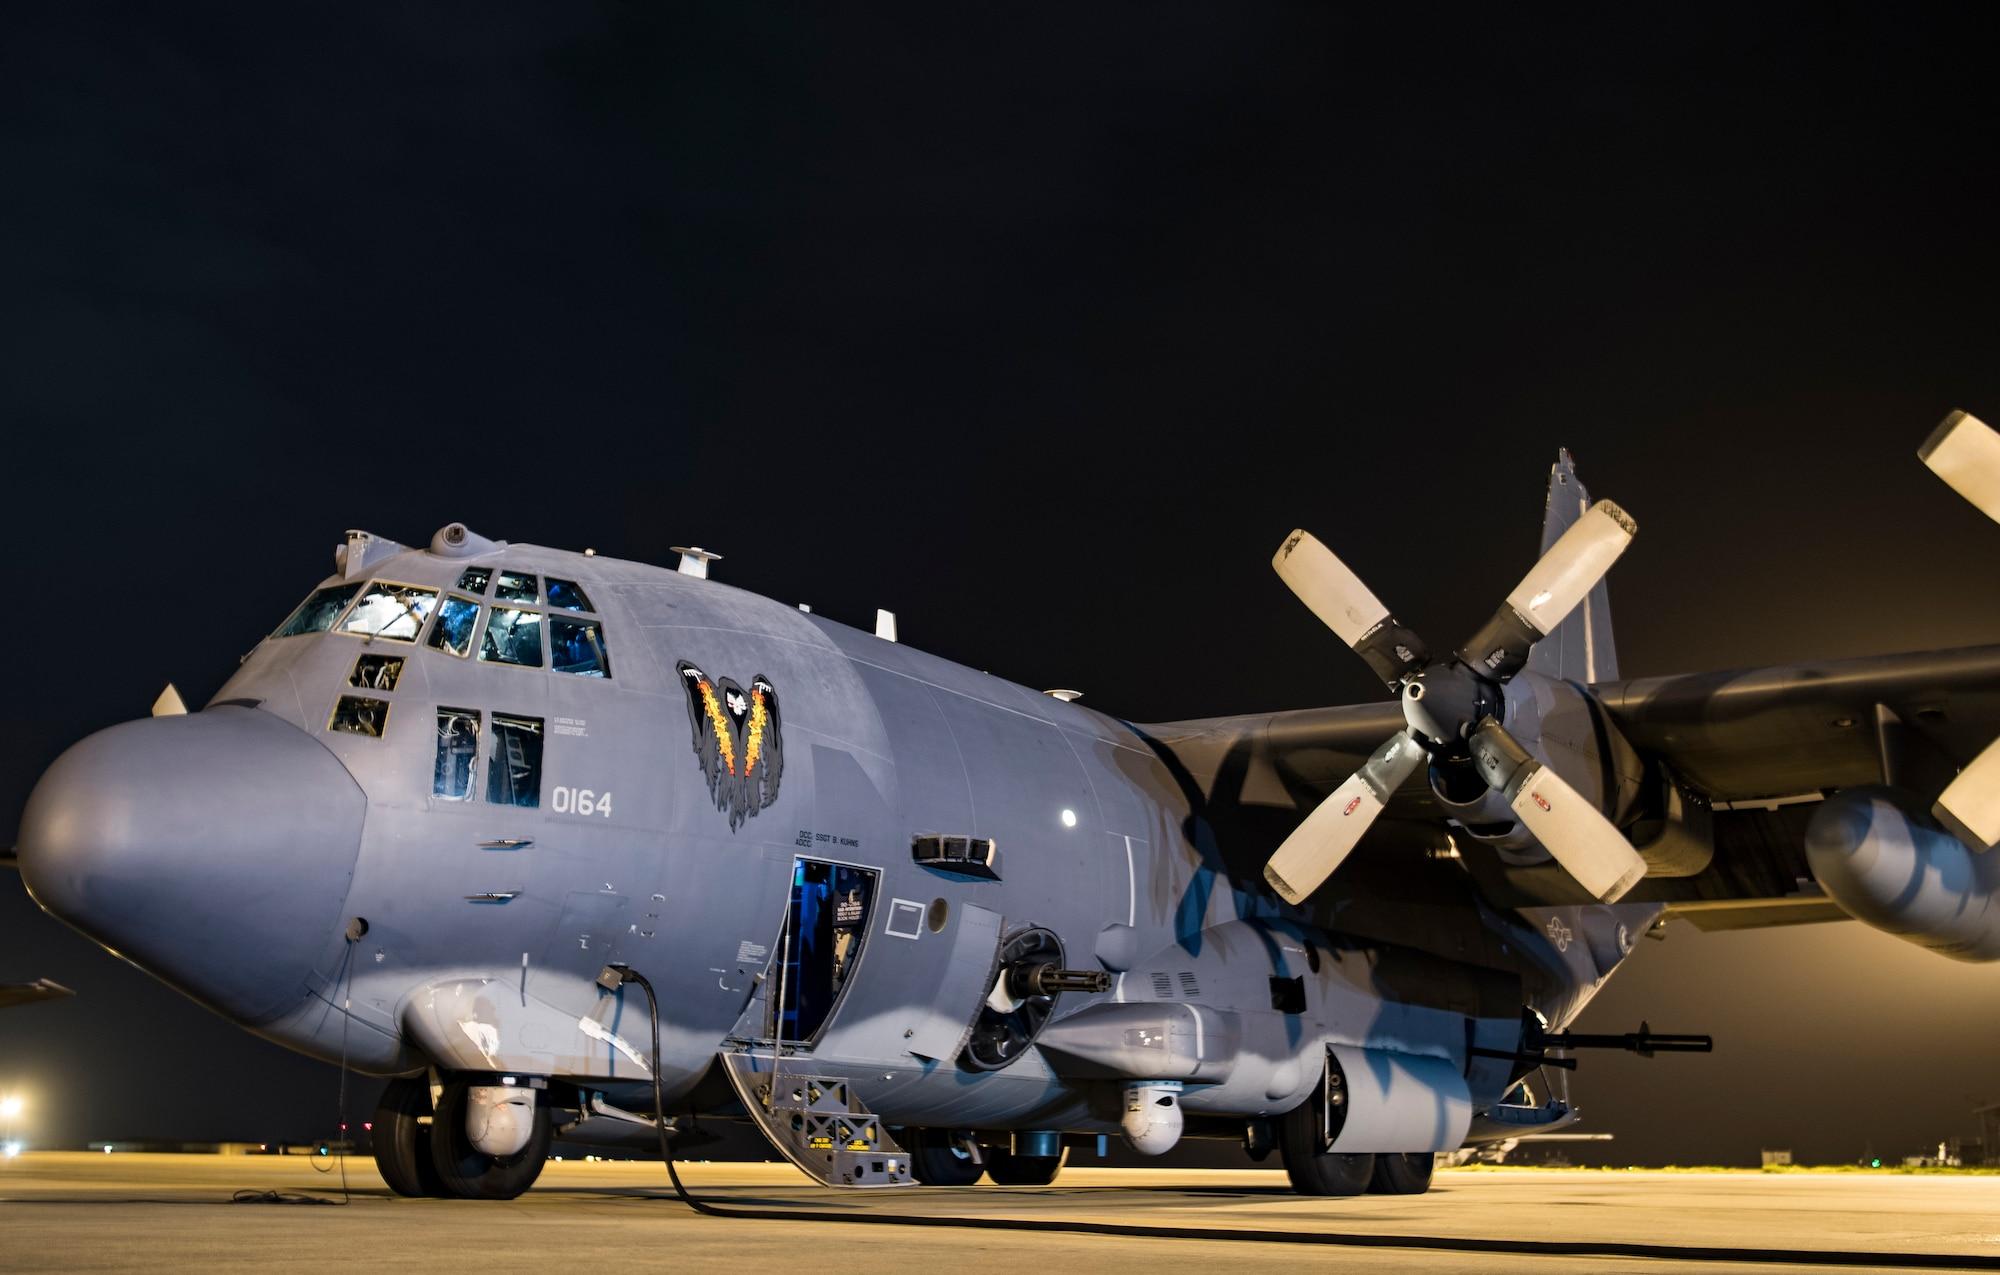 AC-130J Ghostrider